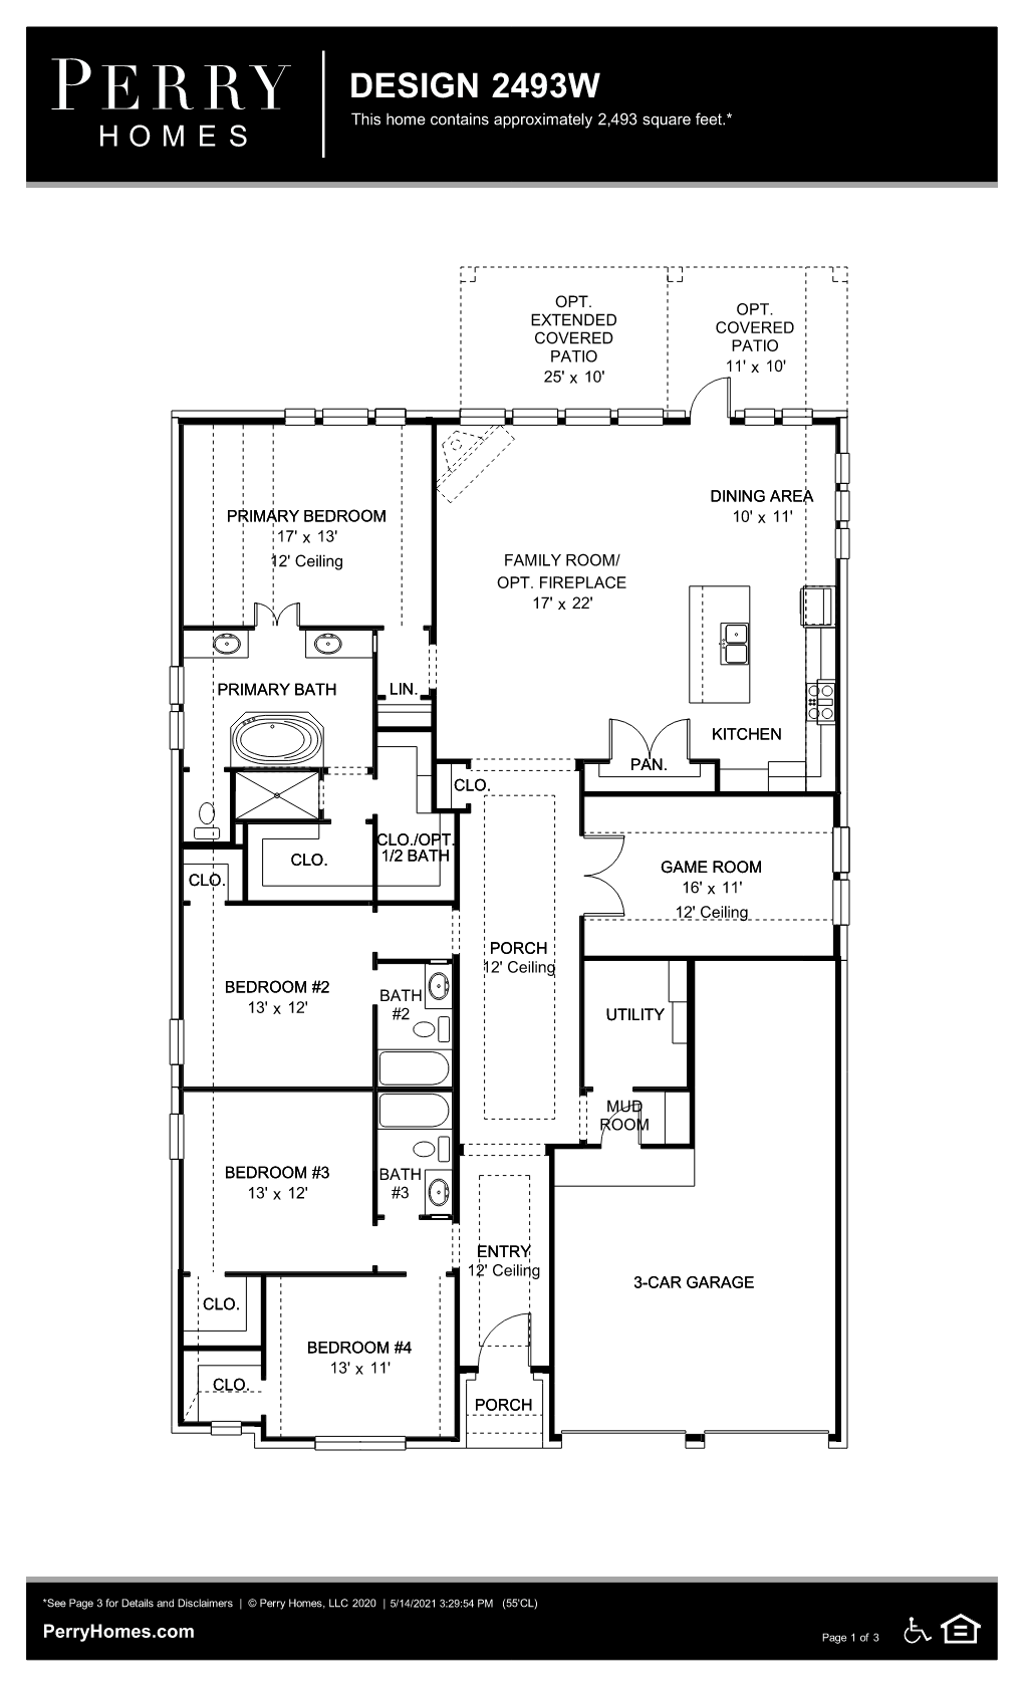 Floor Plan for 2493W